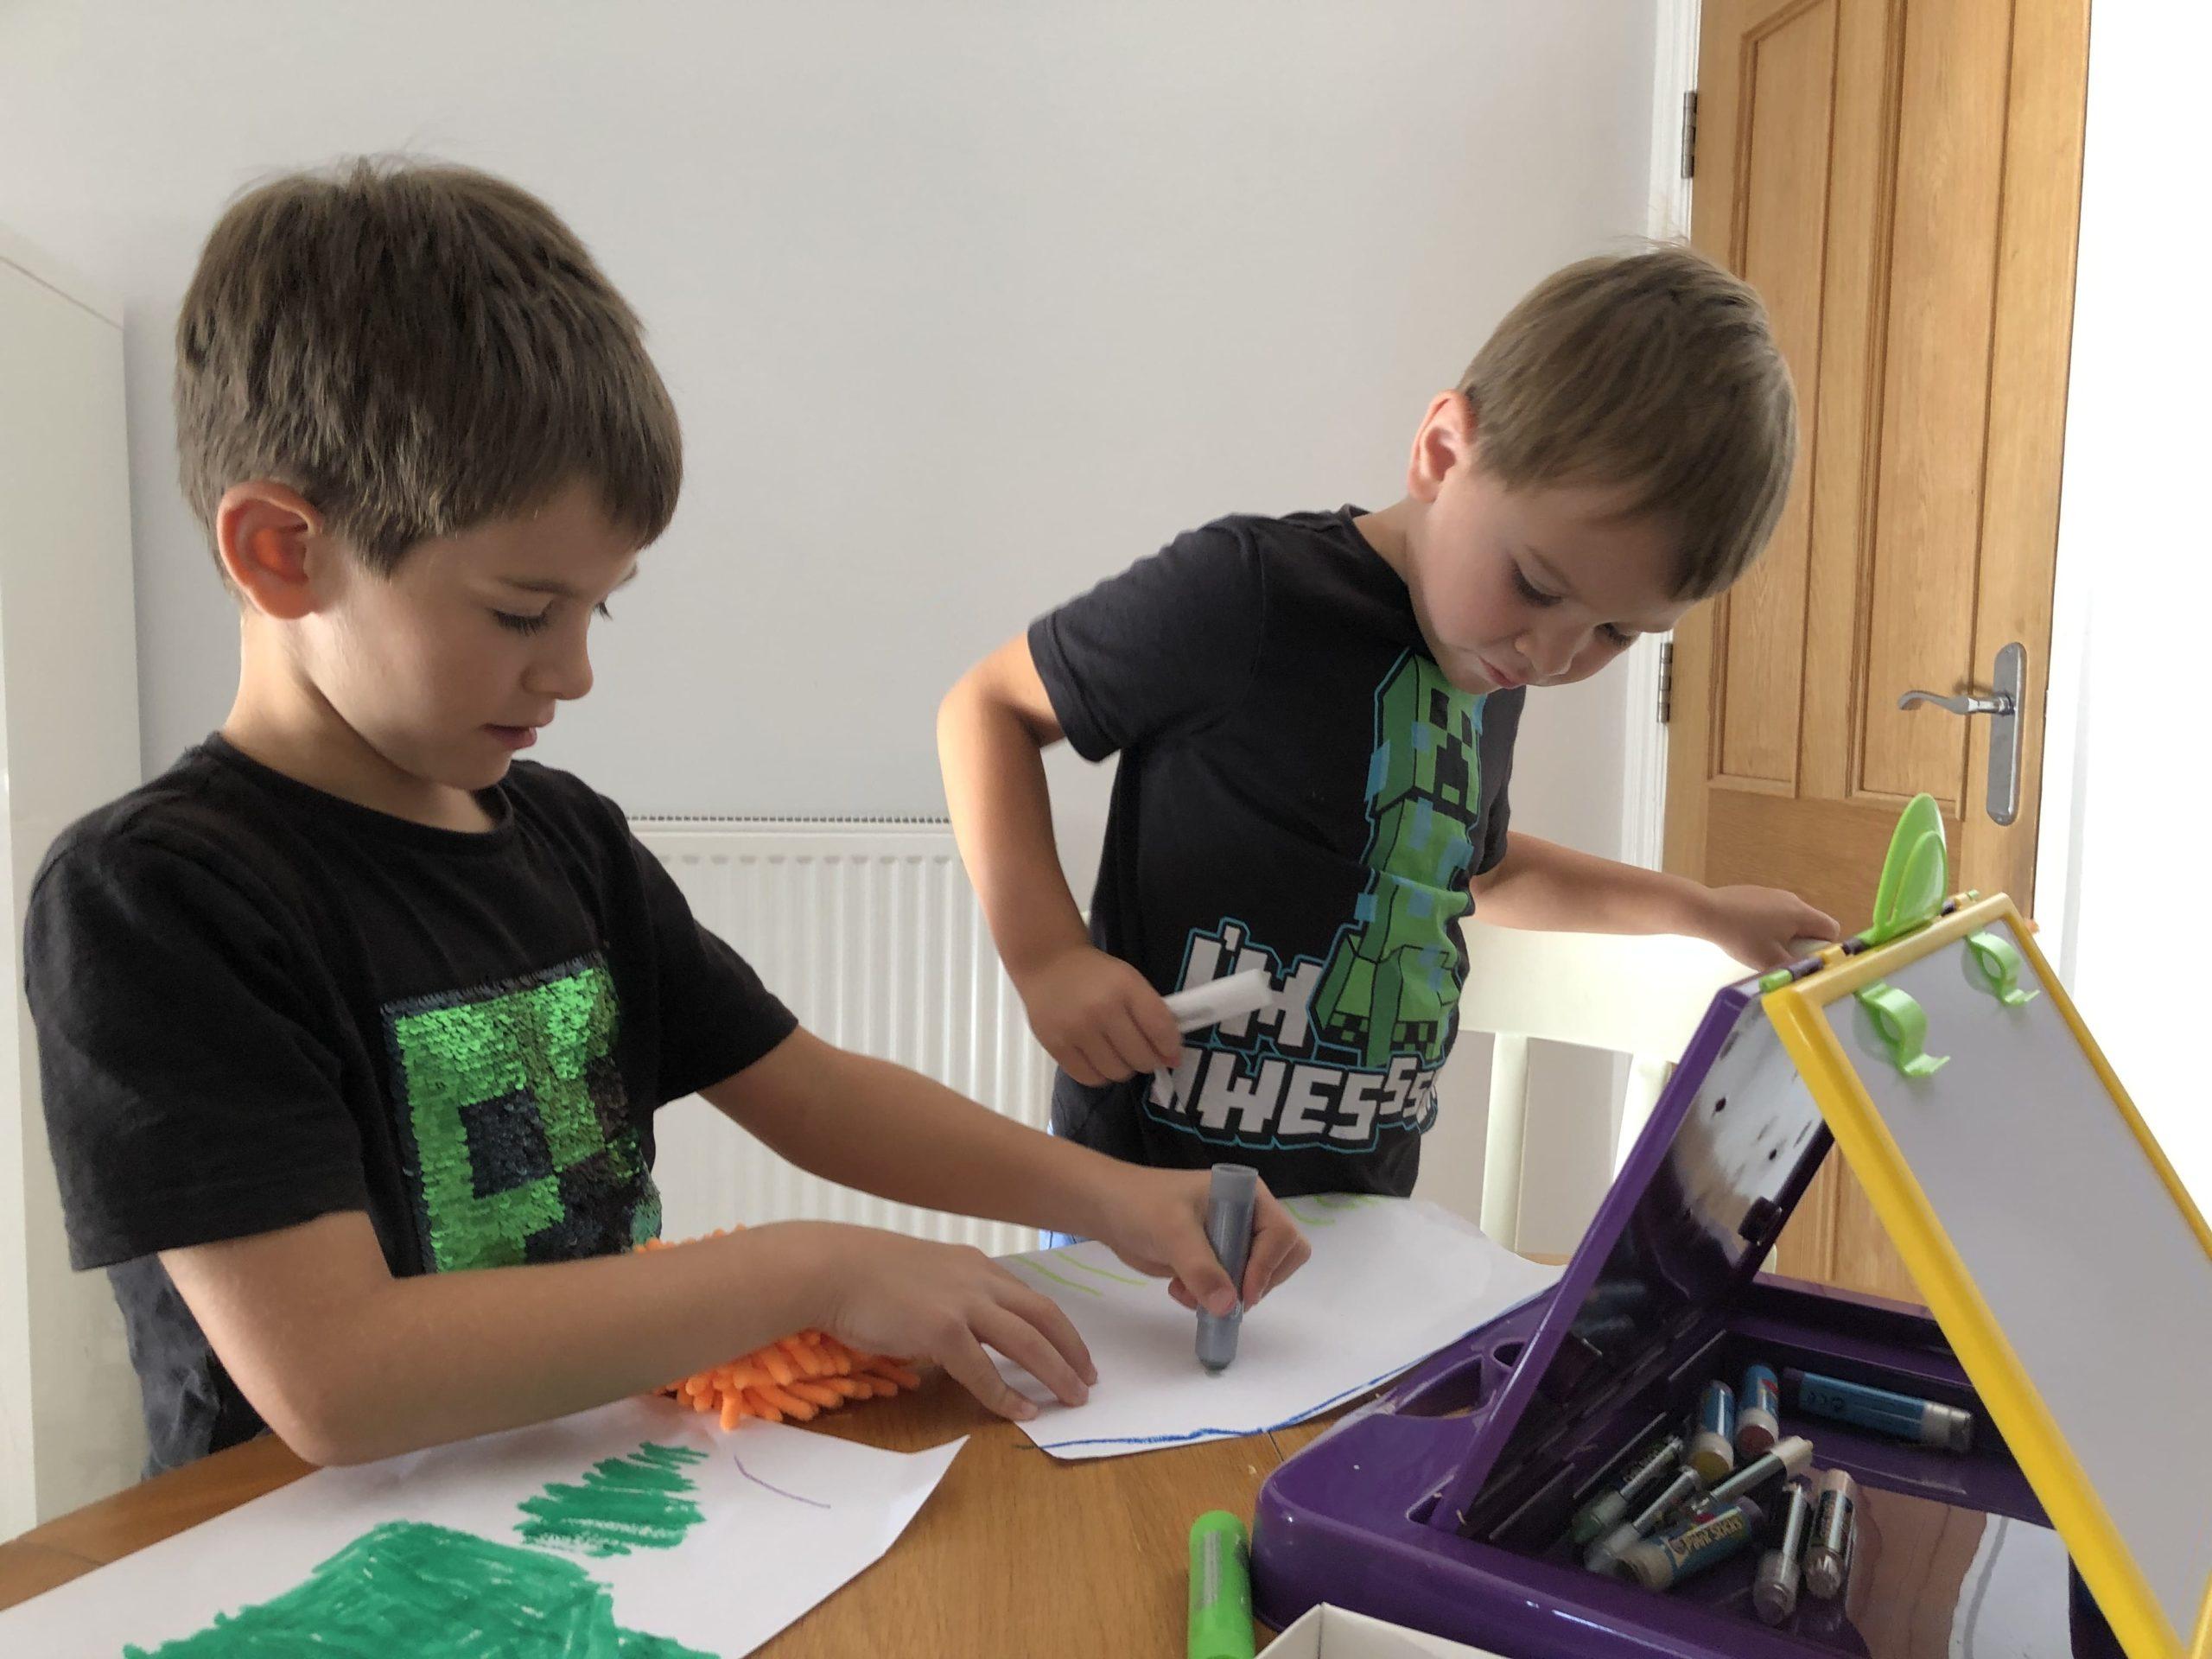 Little Brian Paint Sticks Review